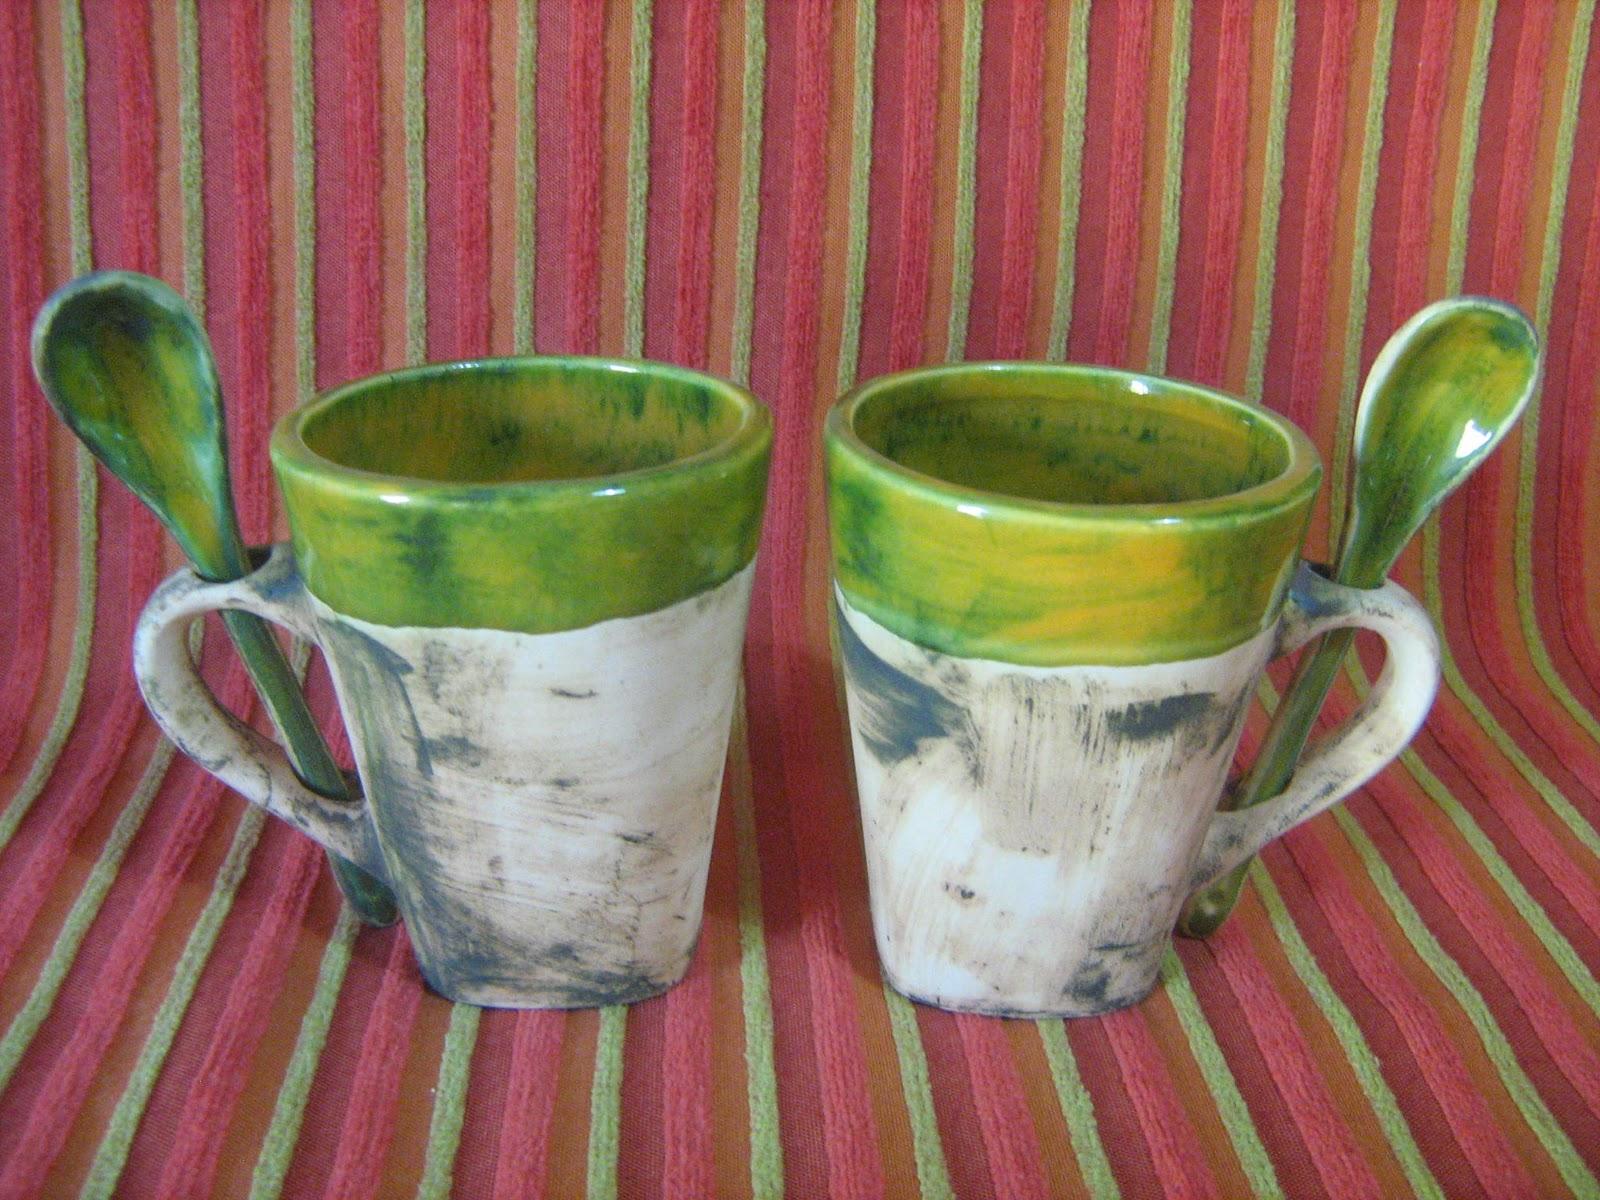 Hakuna matata ceramica artesanal tacitas c cucharita for Herramientas ceramica artesanal